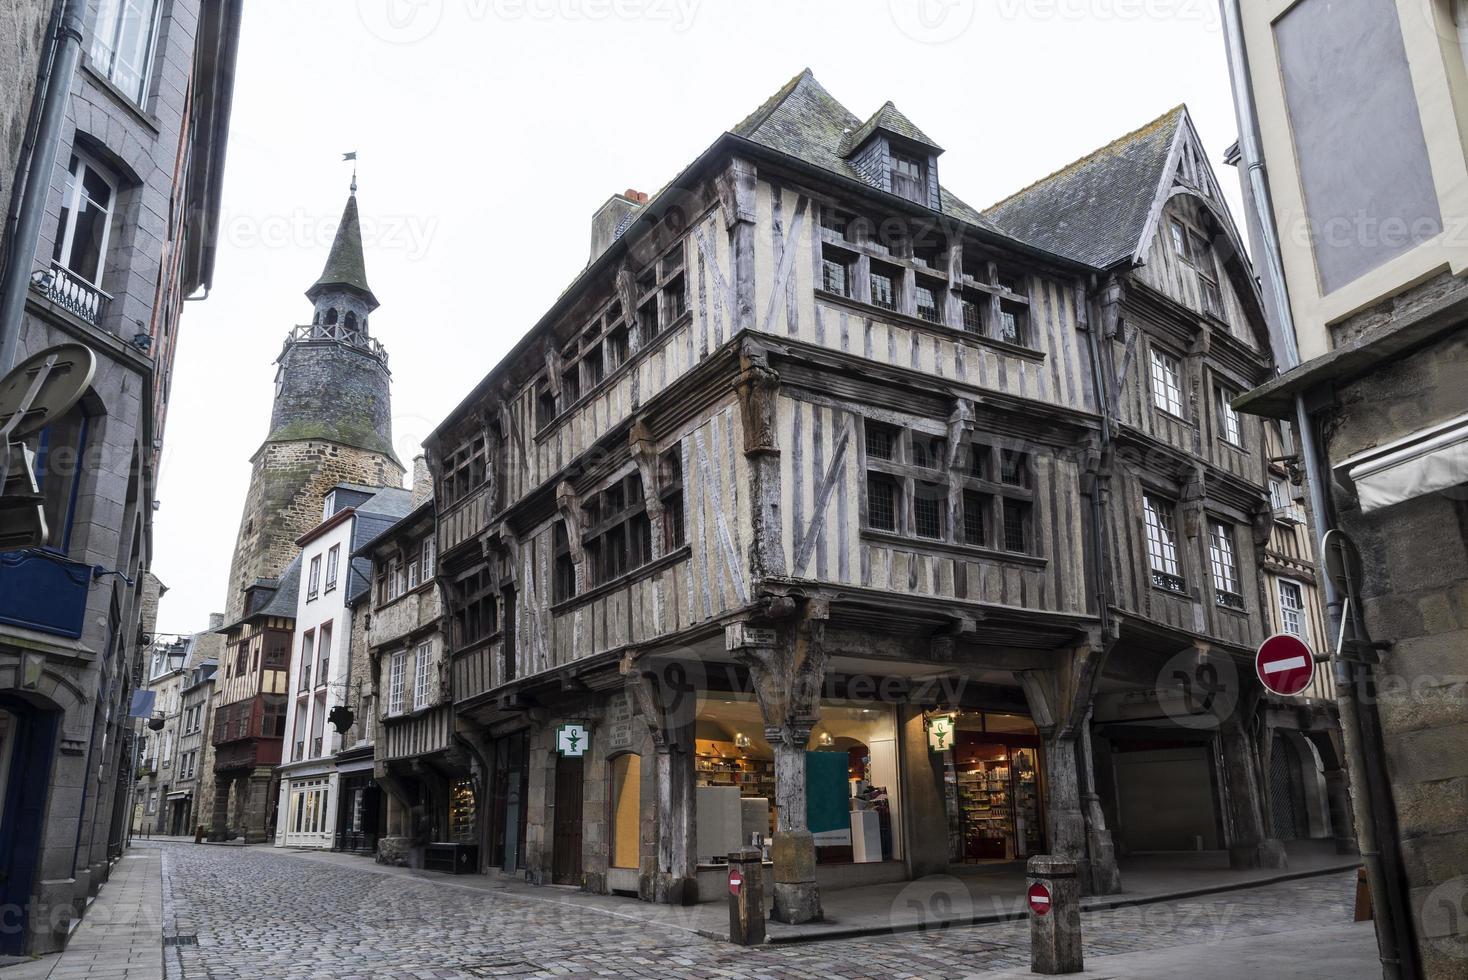 medeltida konstruktioner i bretagne, Frankrike foto